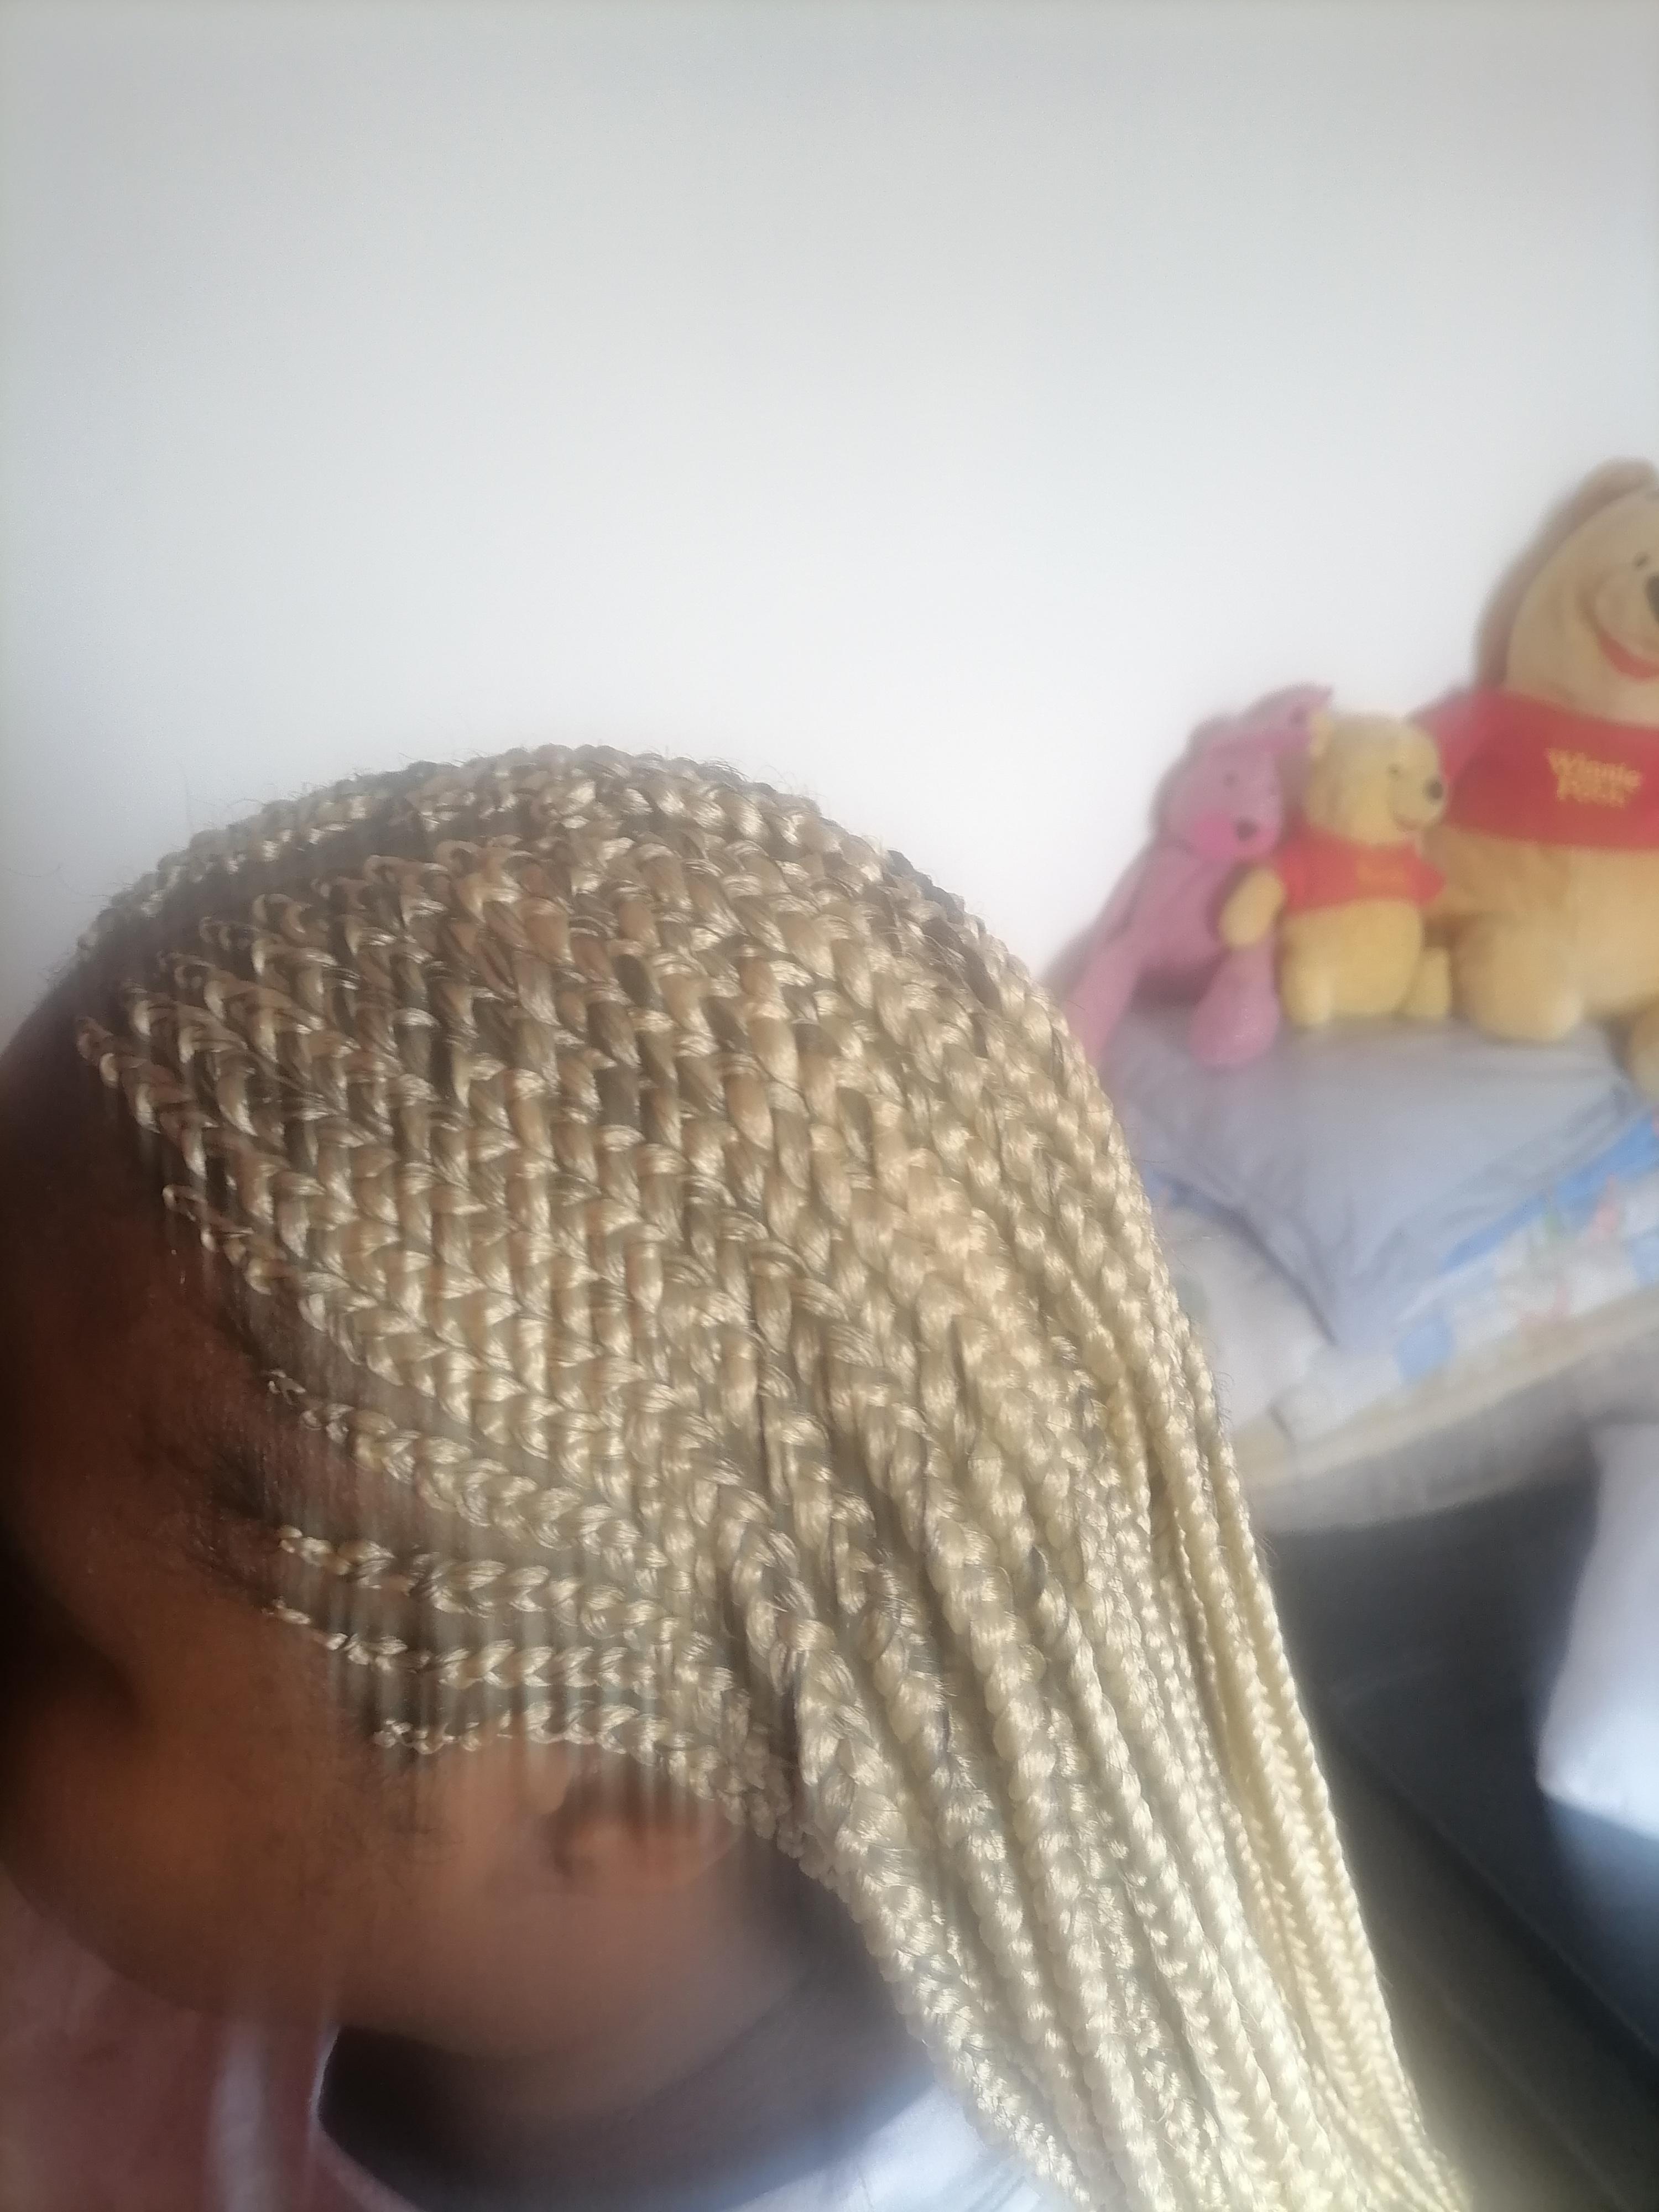 salon de coiffure afro tresse tresses box braids crochet braids vanilles tissages paris 75 77 78 91 92 93 94 95 NHIIEZXY